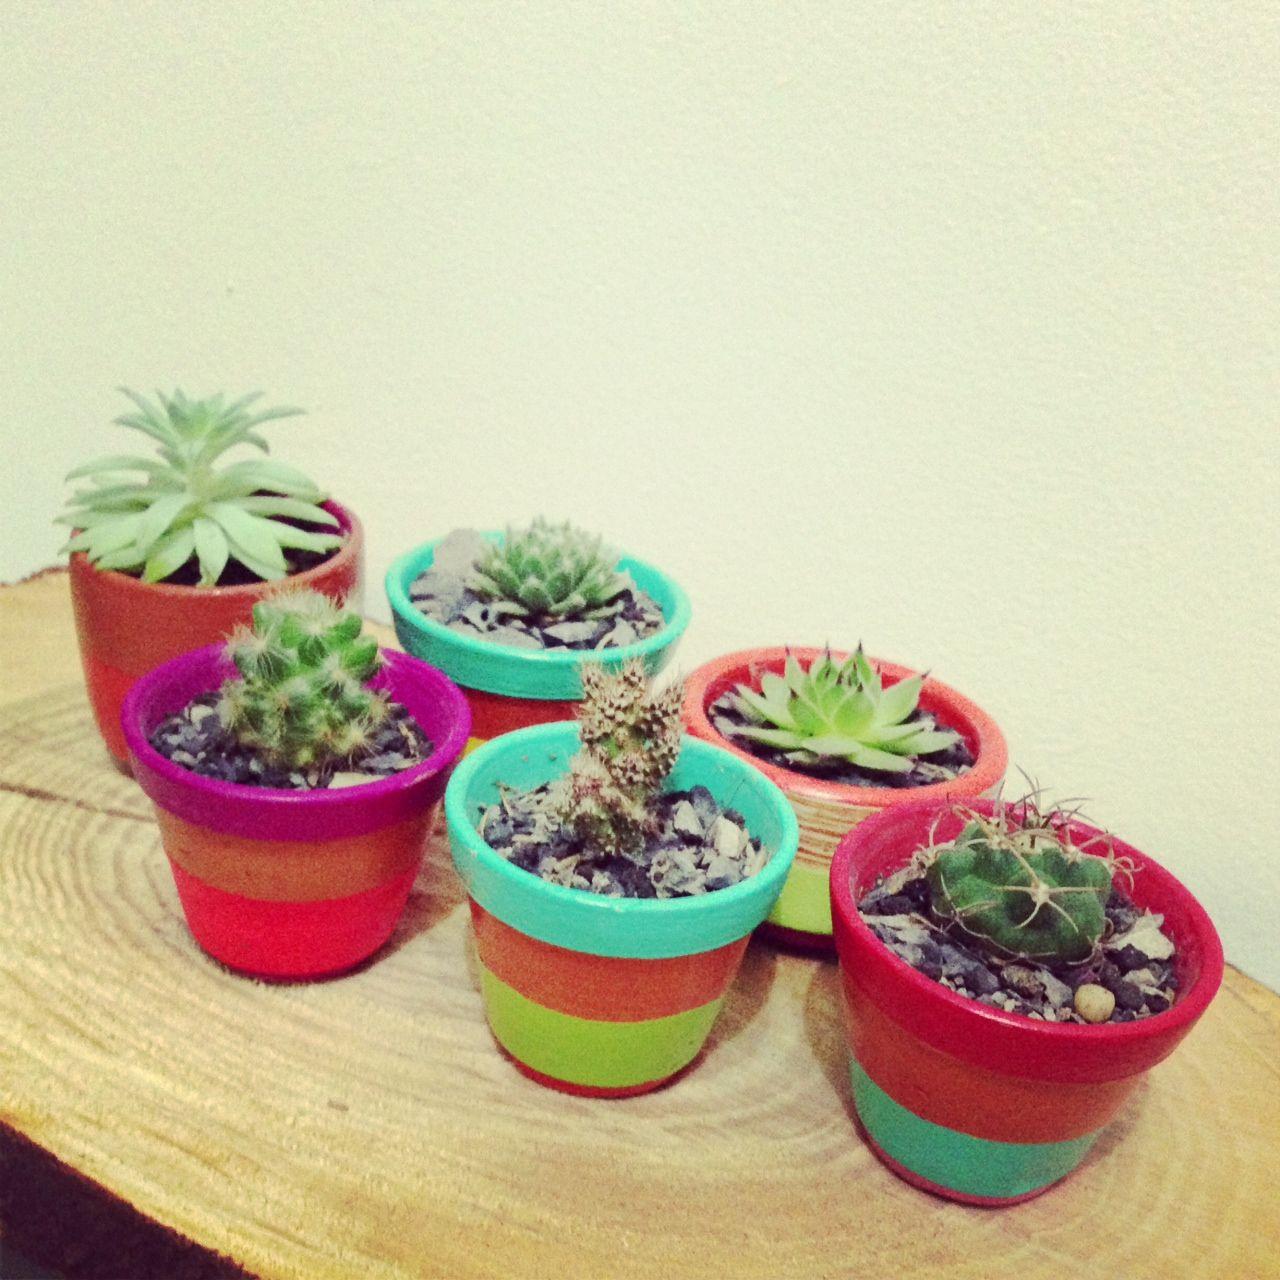 Cactil Cactus Land  Cerámica de Ráquira  Estampado a mano  Bogotá, Colombia